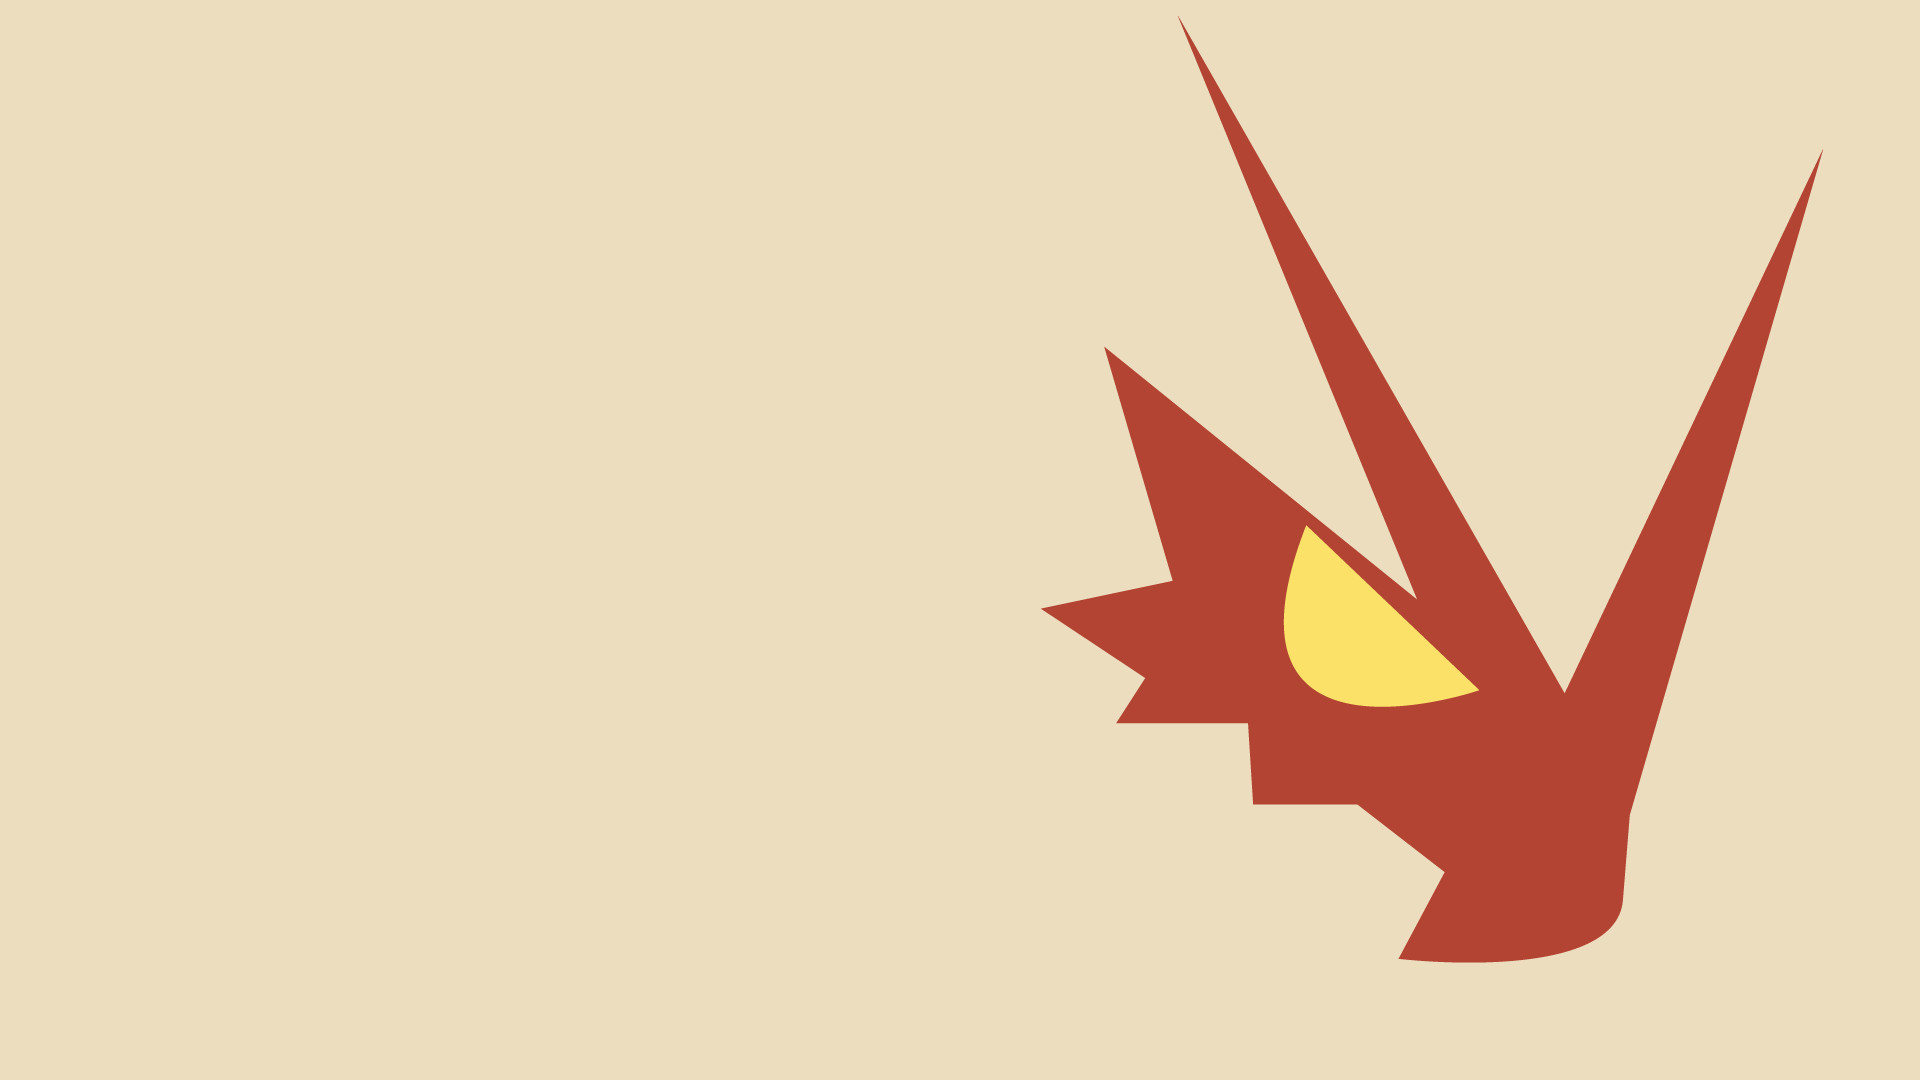 Anime РPok̩mon Blaziken (Pok̩mon) Fire Pok̩mon Wallpaper